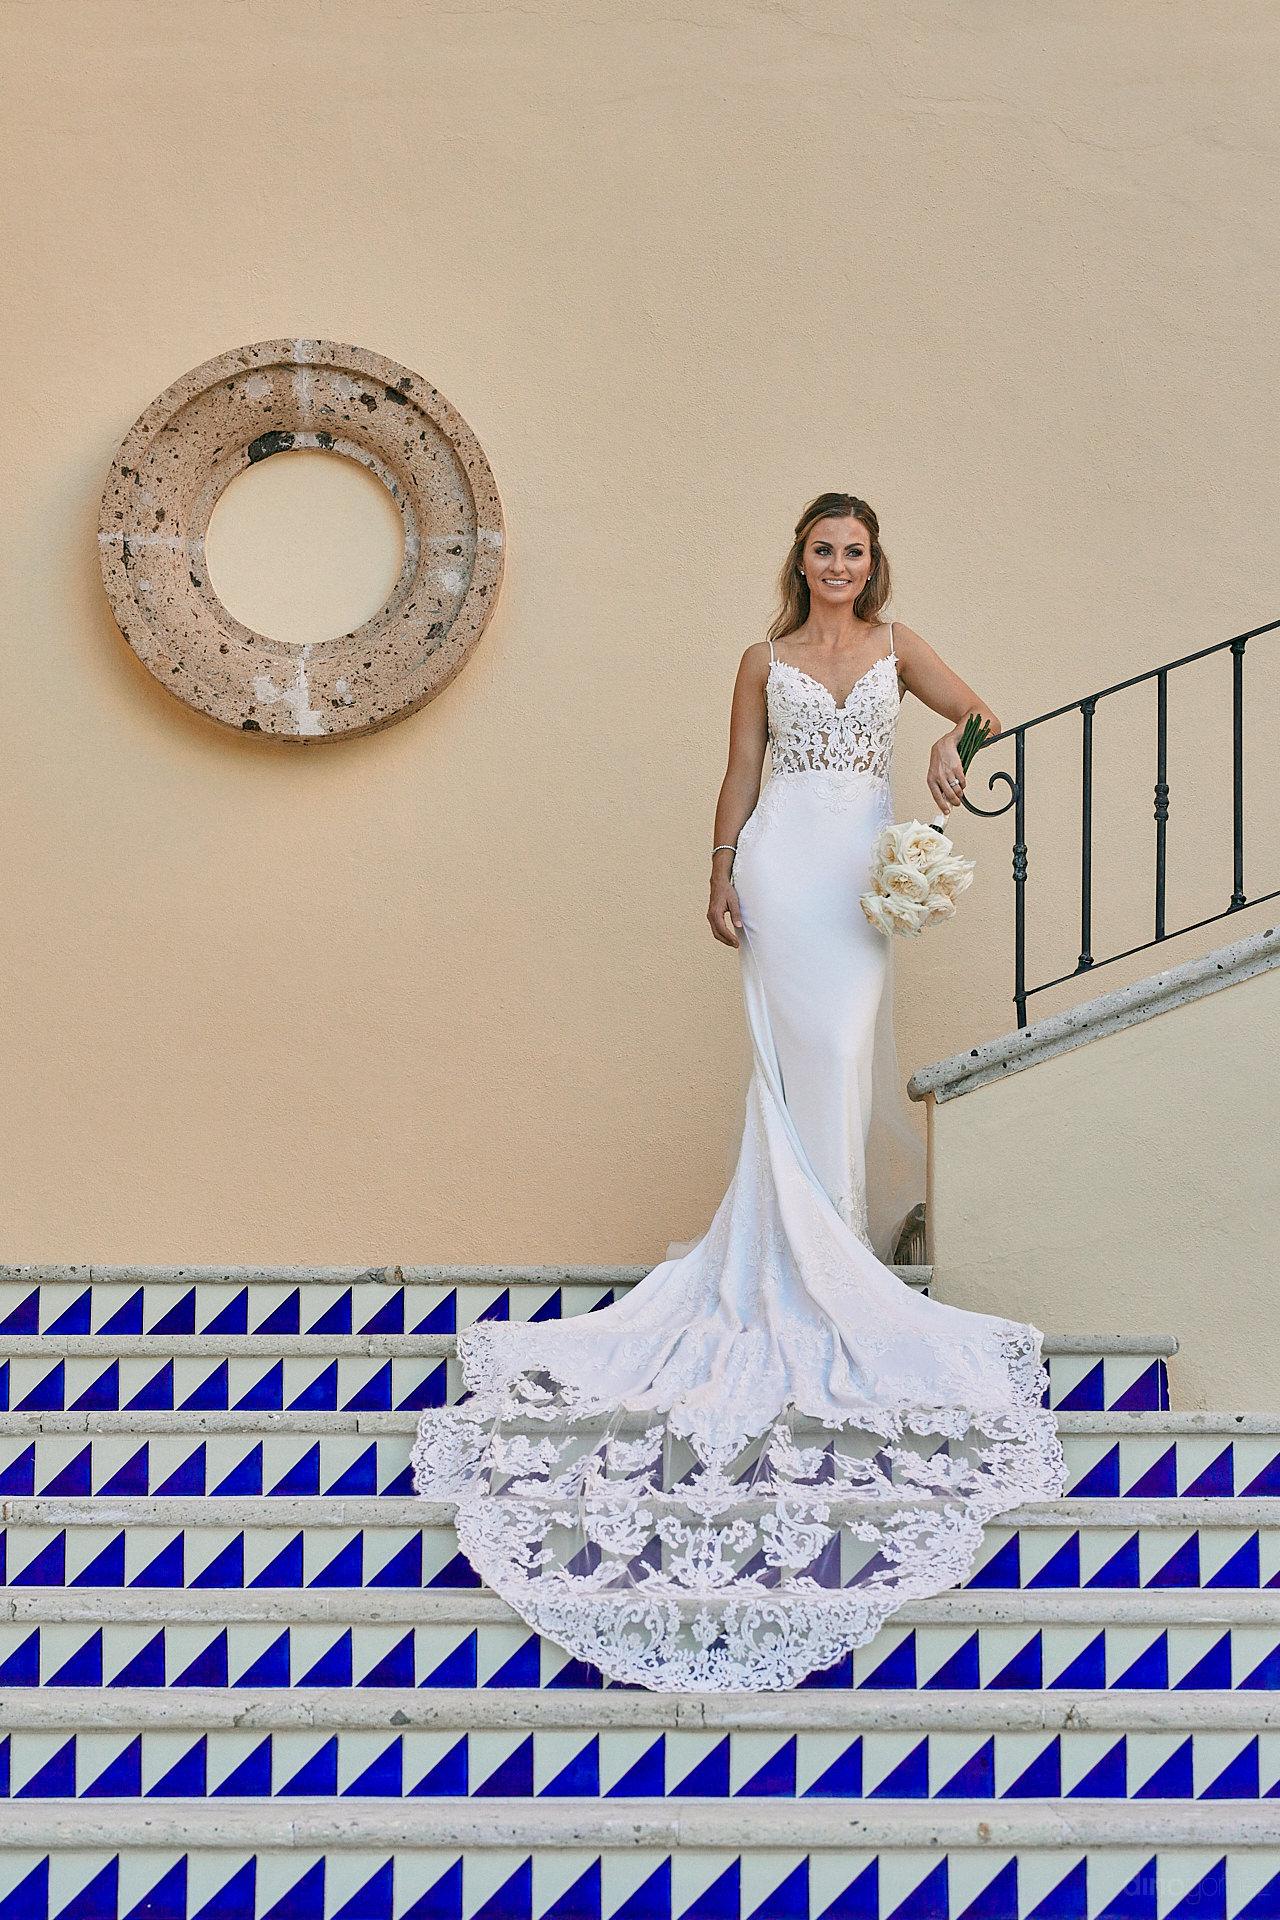 Cabos Premier Destination Wedding Photographer